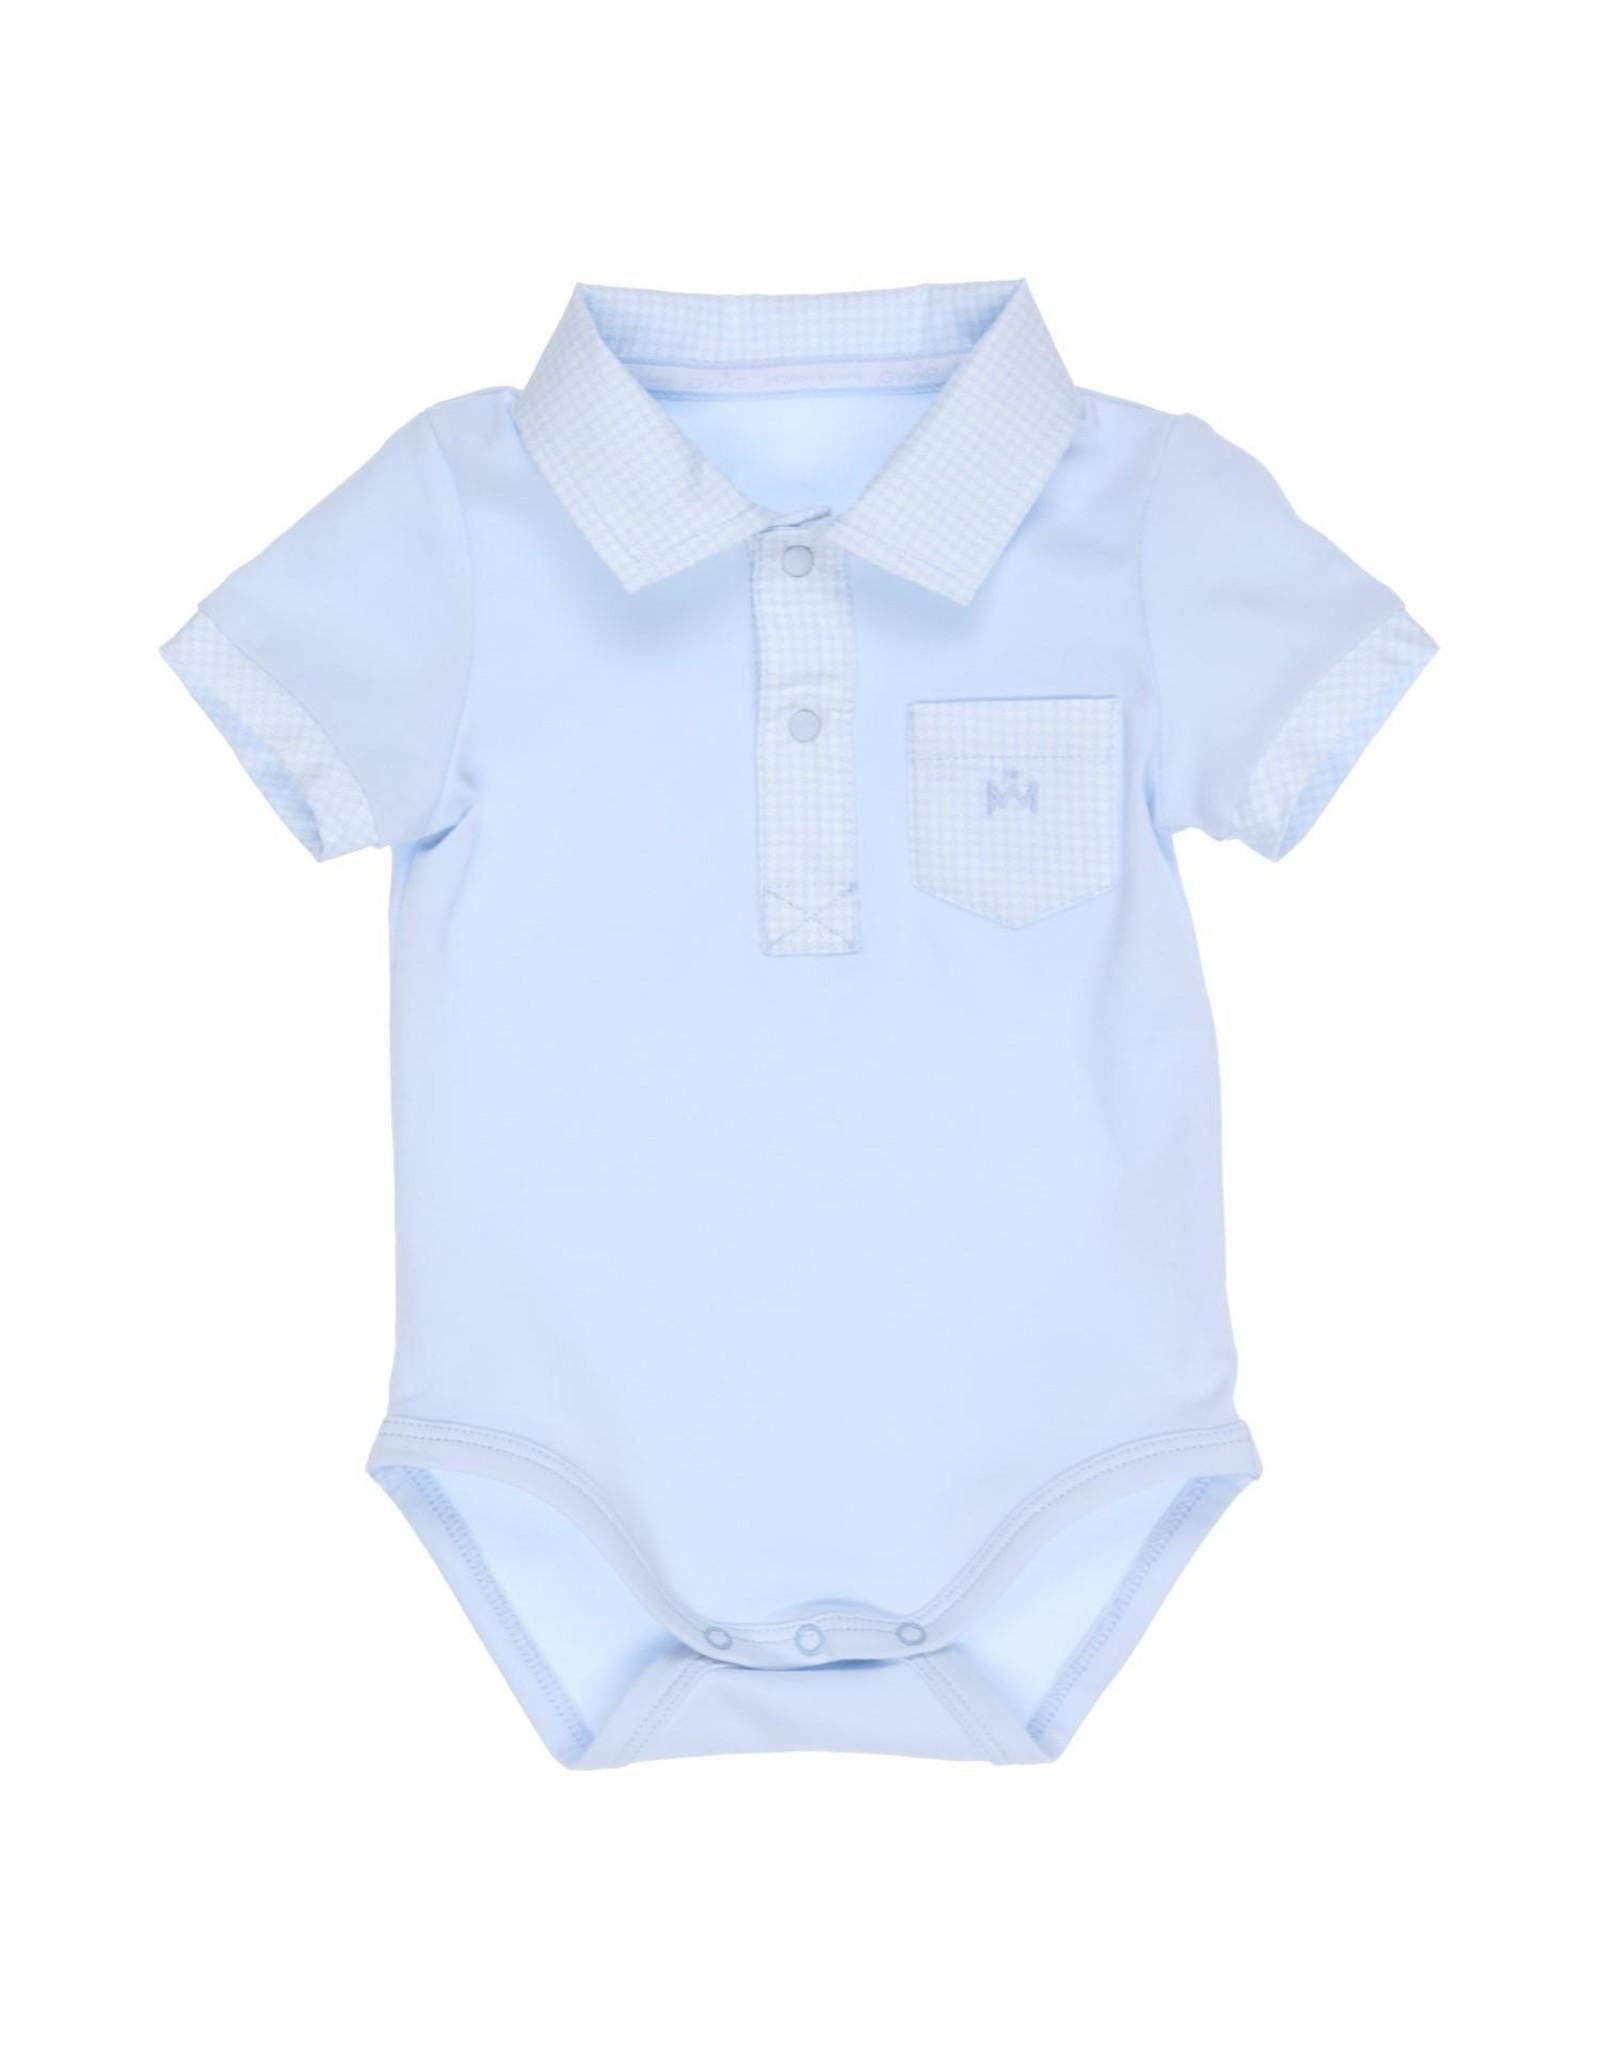 Gymp babypakje - polo romper - aero lichtblauw